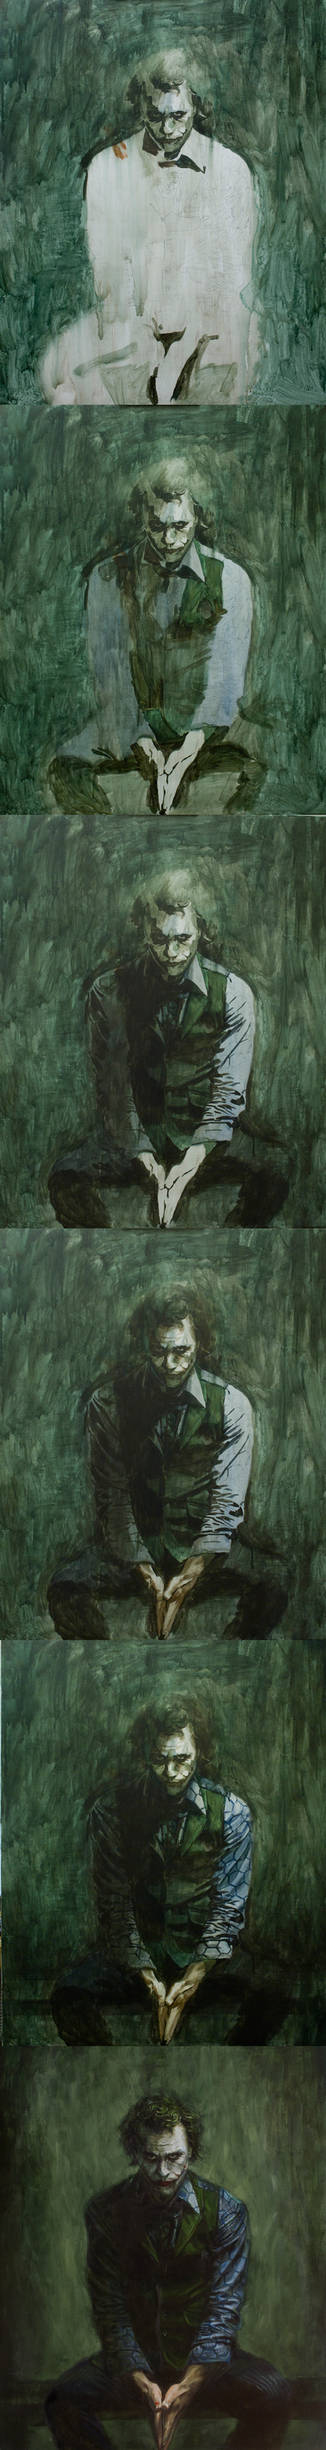 The Joker - WIP